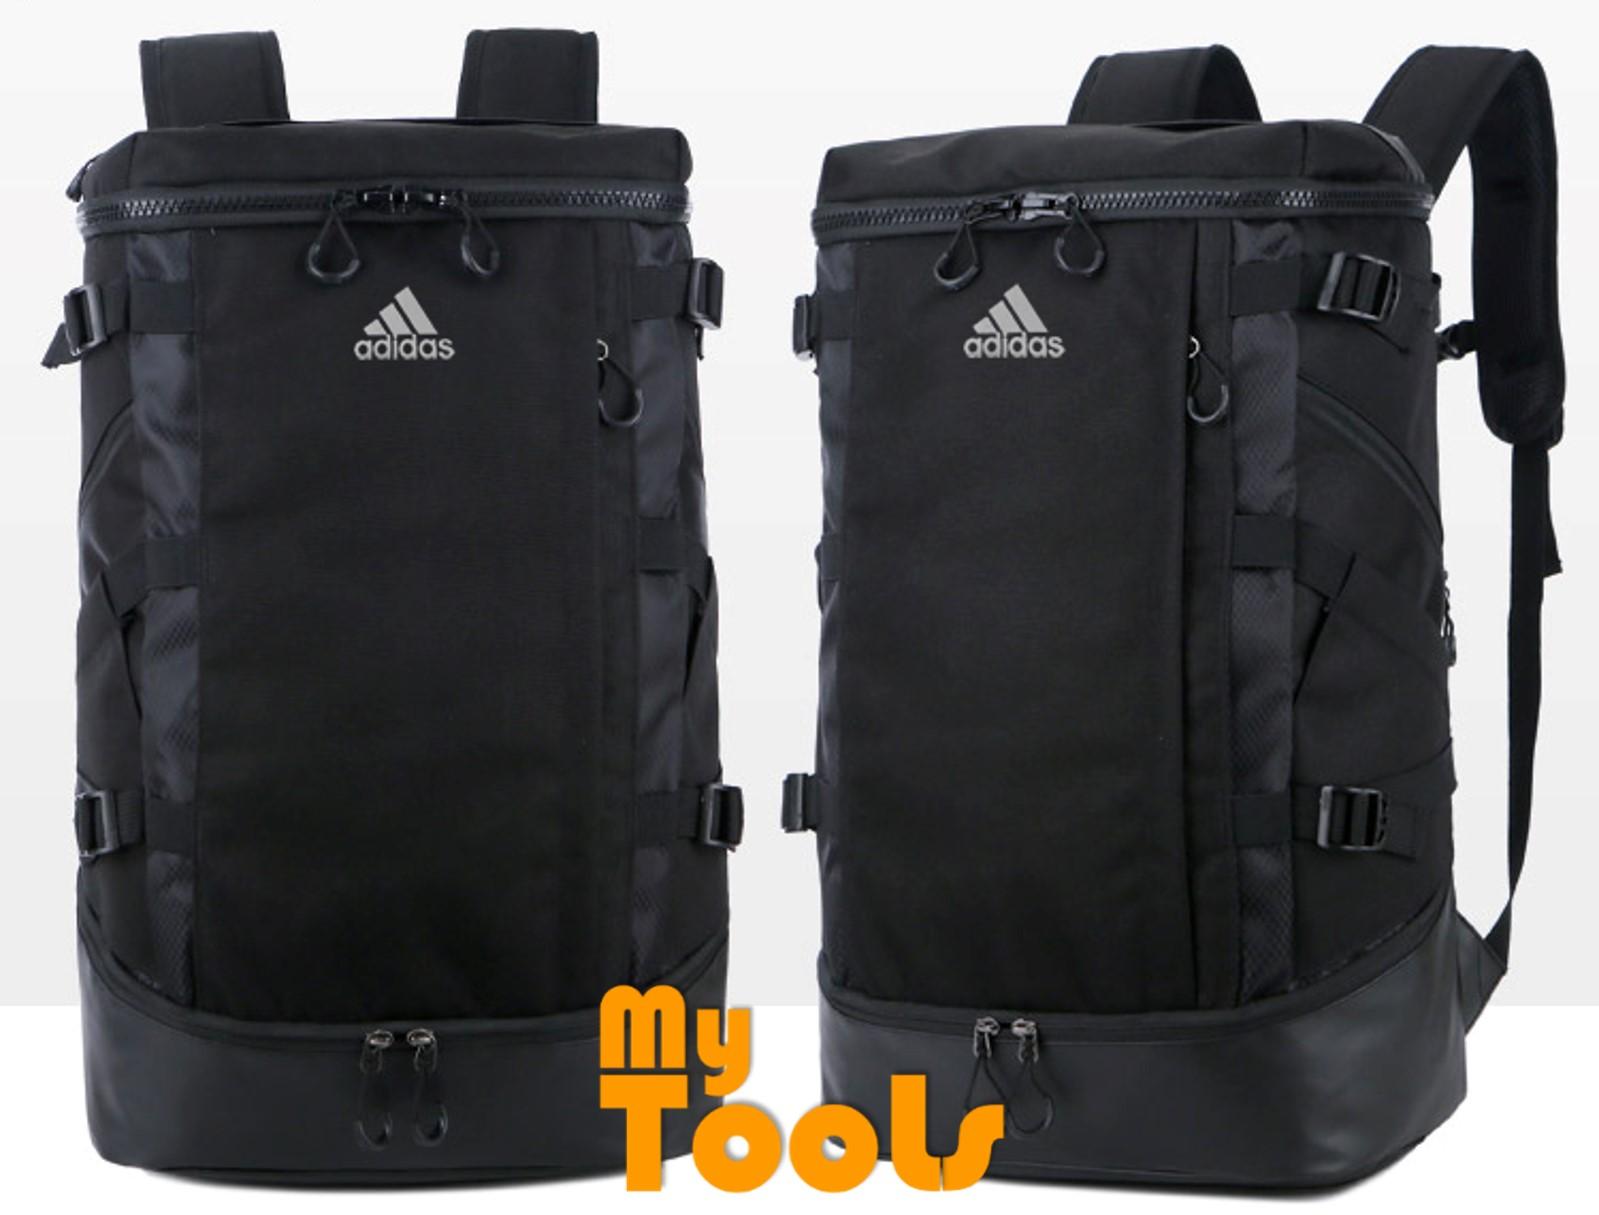 Adidas Unisex Casual Backpack Rucksacks Travel Bag 35L